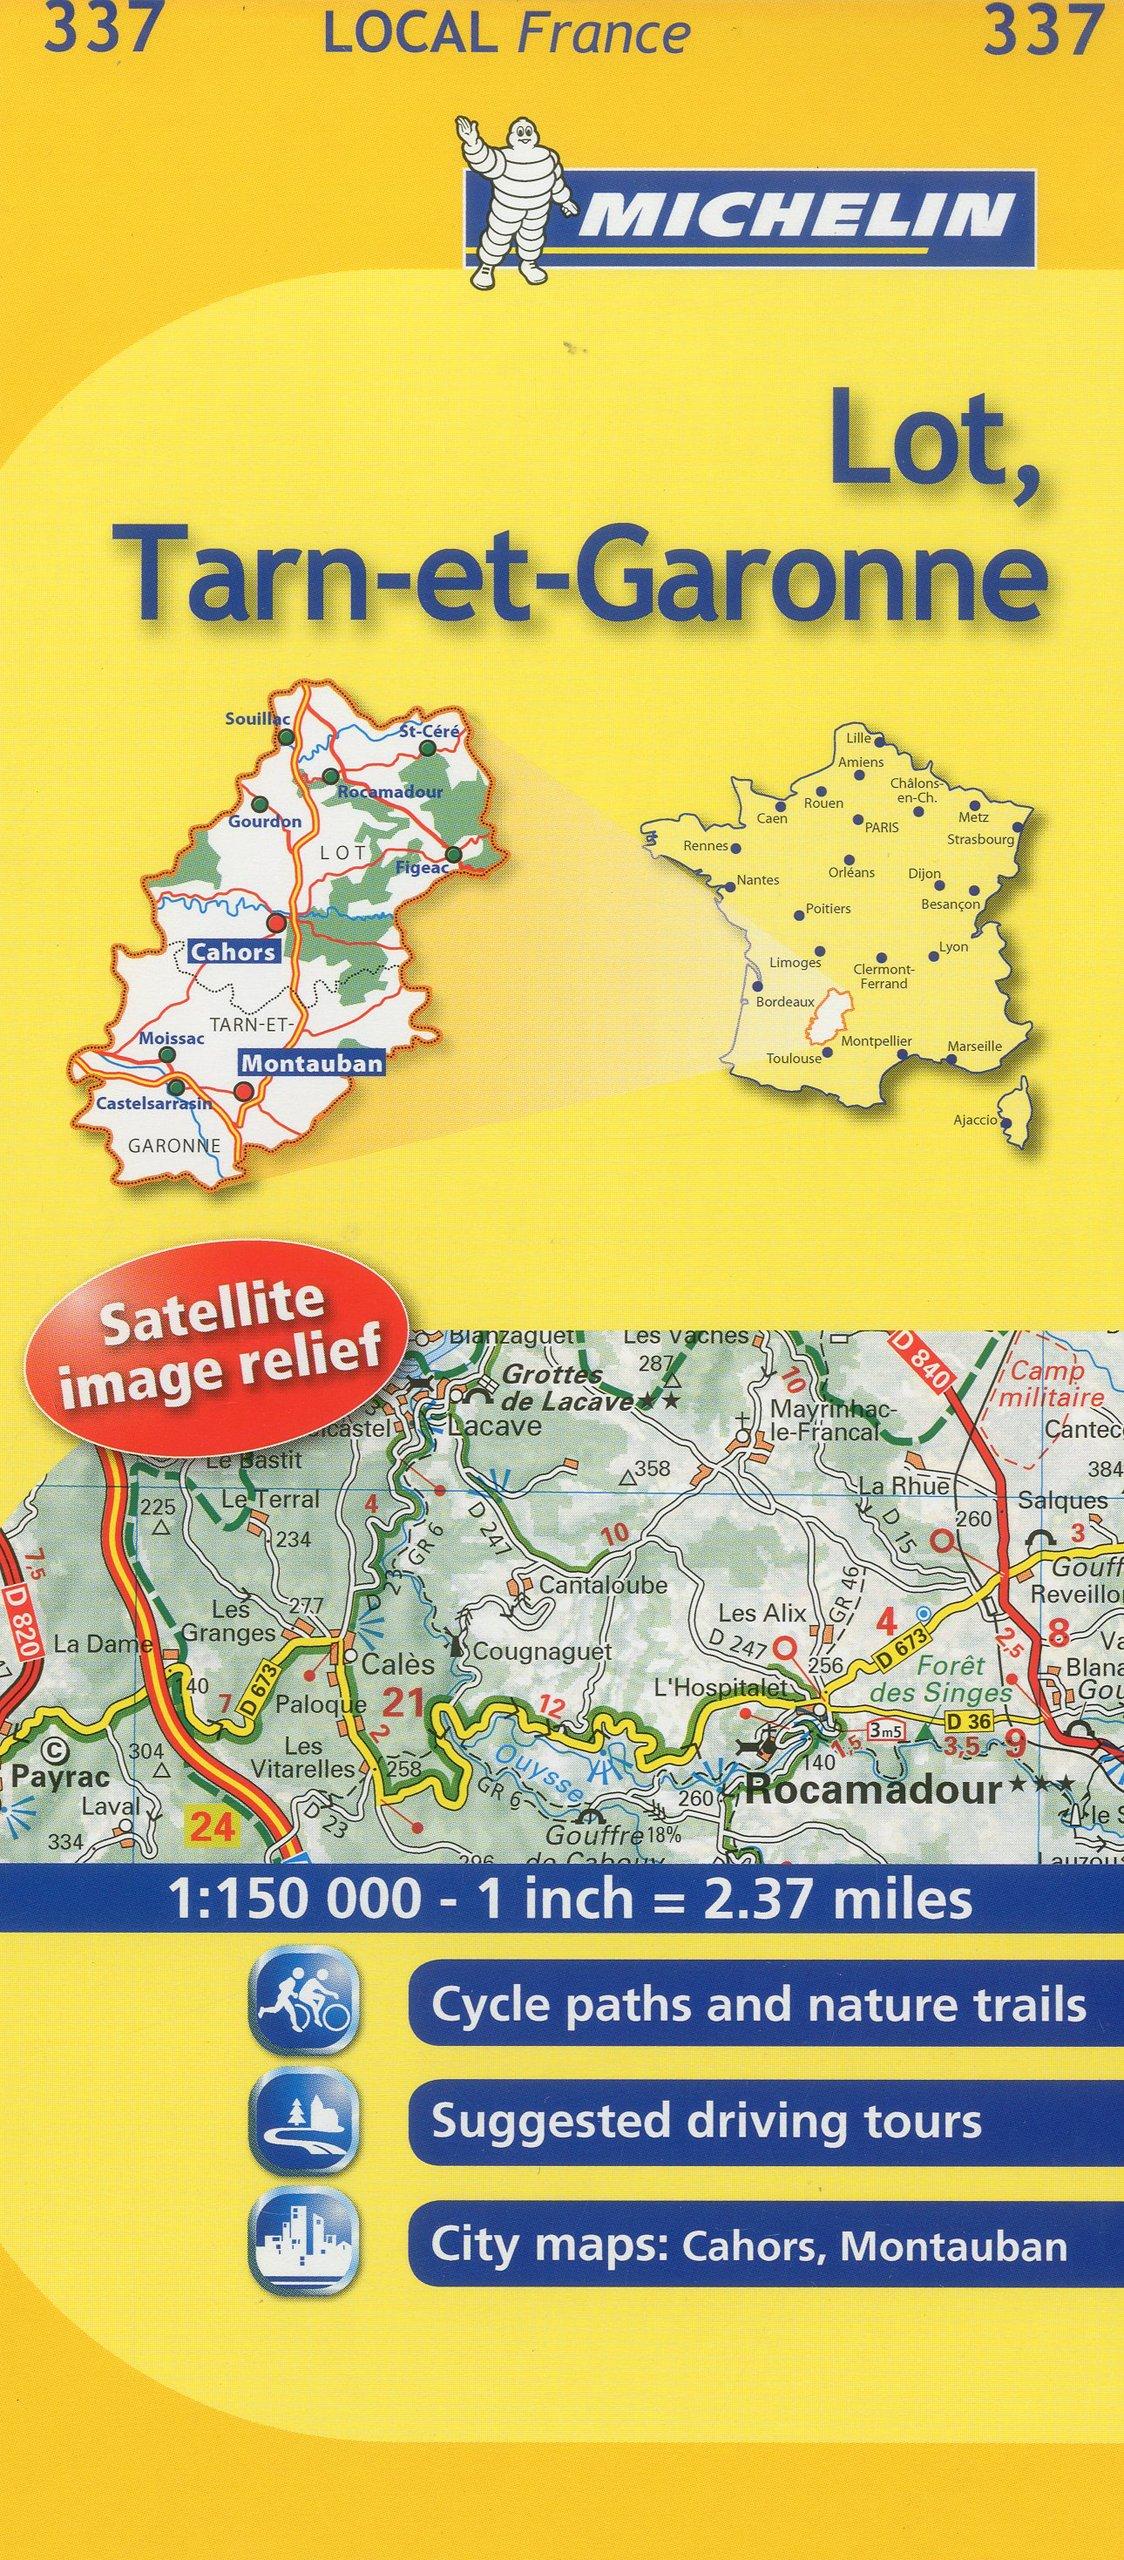 Map Of Lot France.Michelin Map France Lot Tarn Et Garonne 337 Maps Local